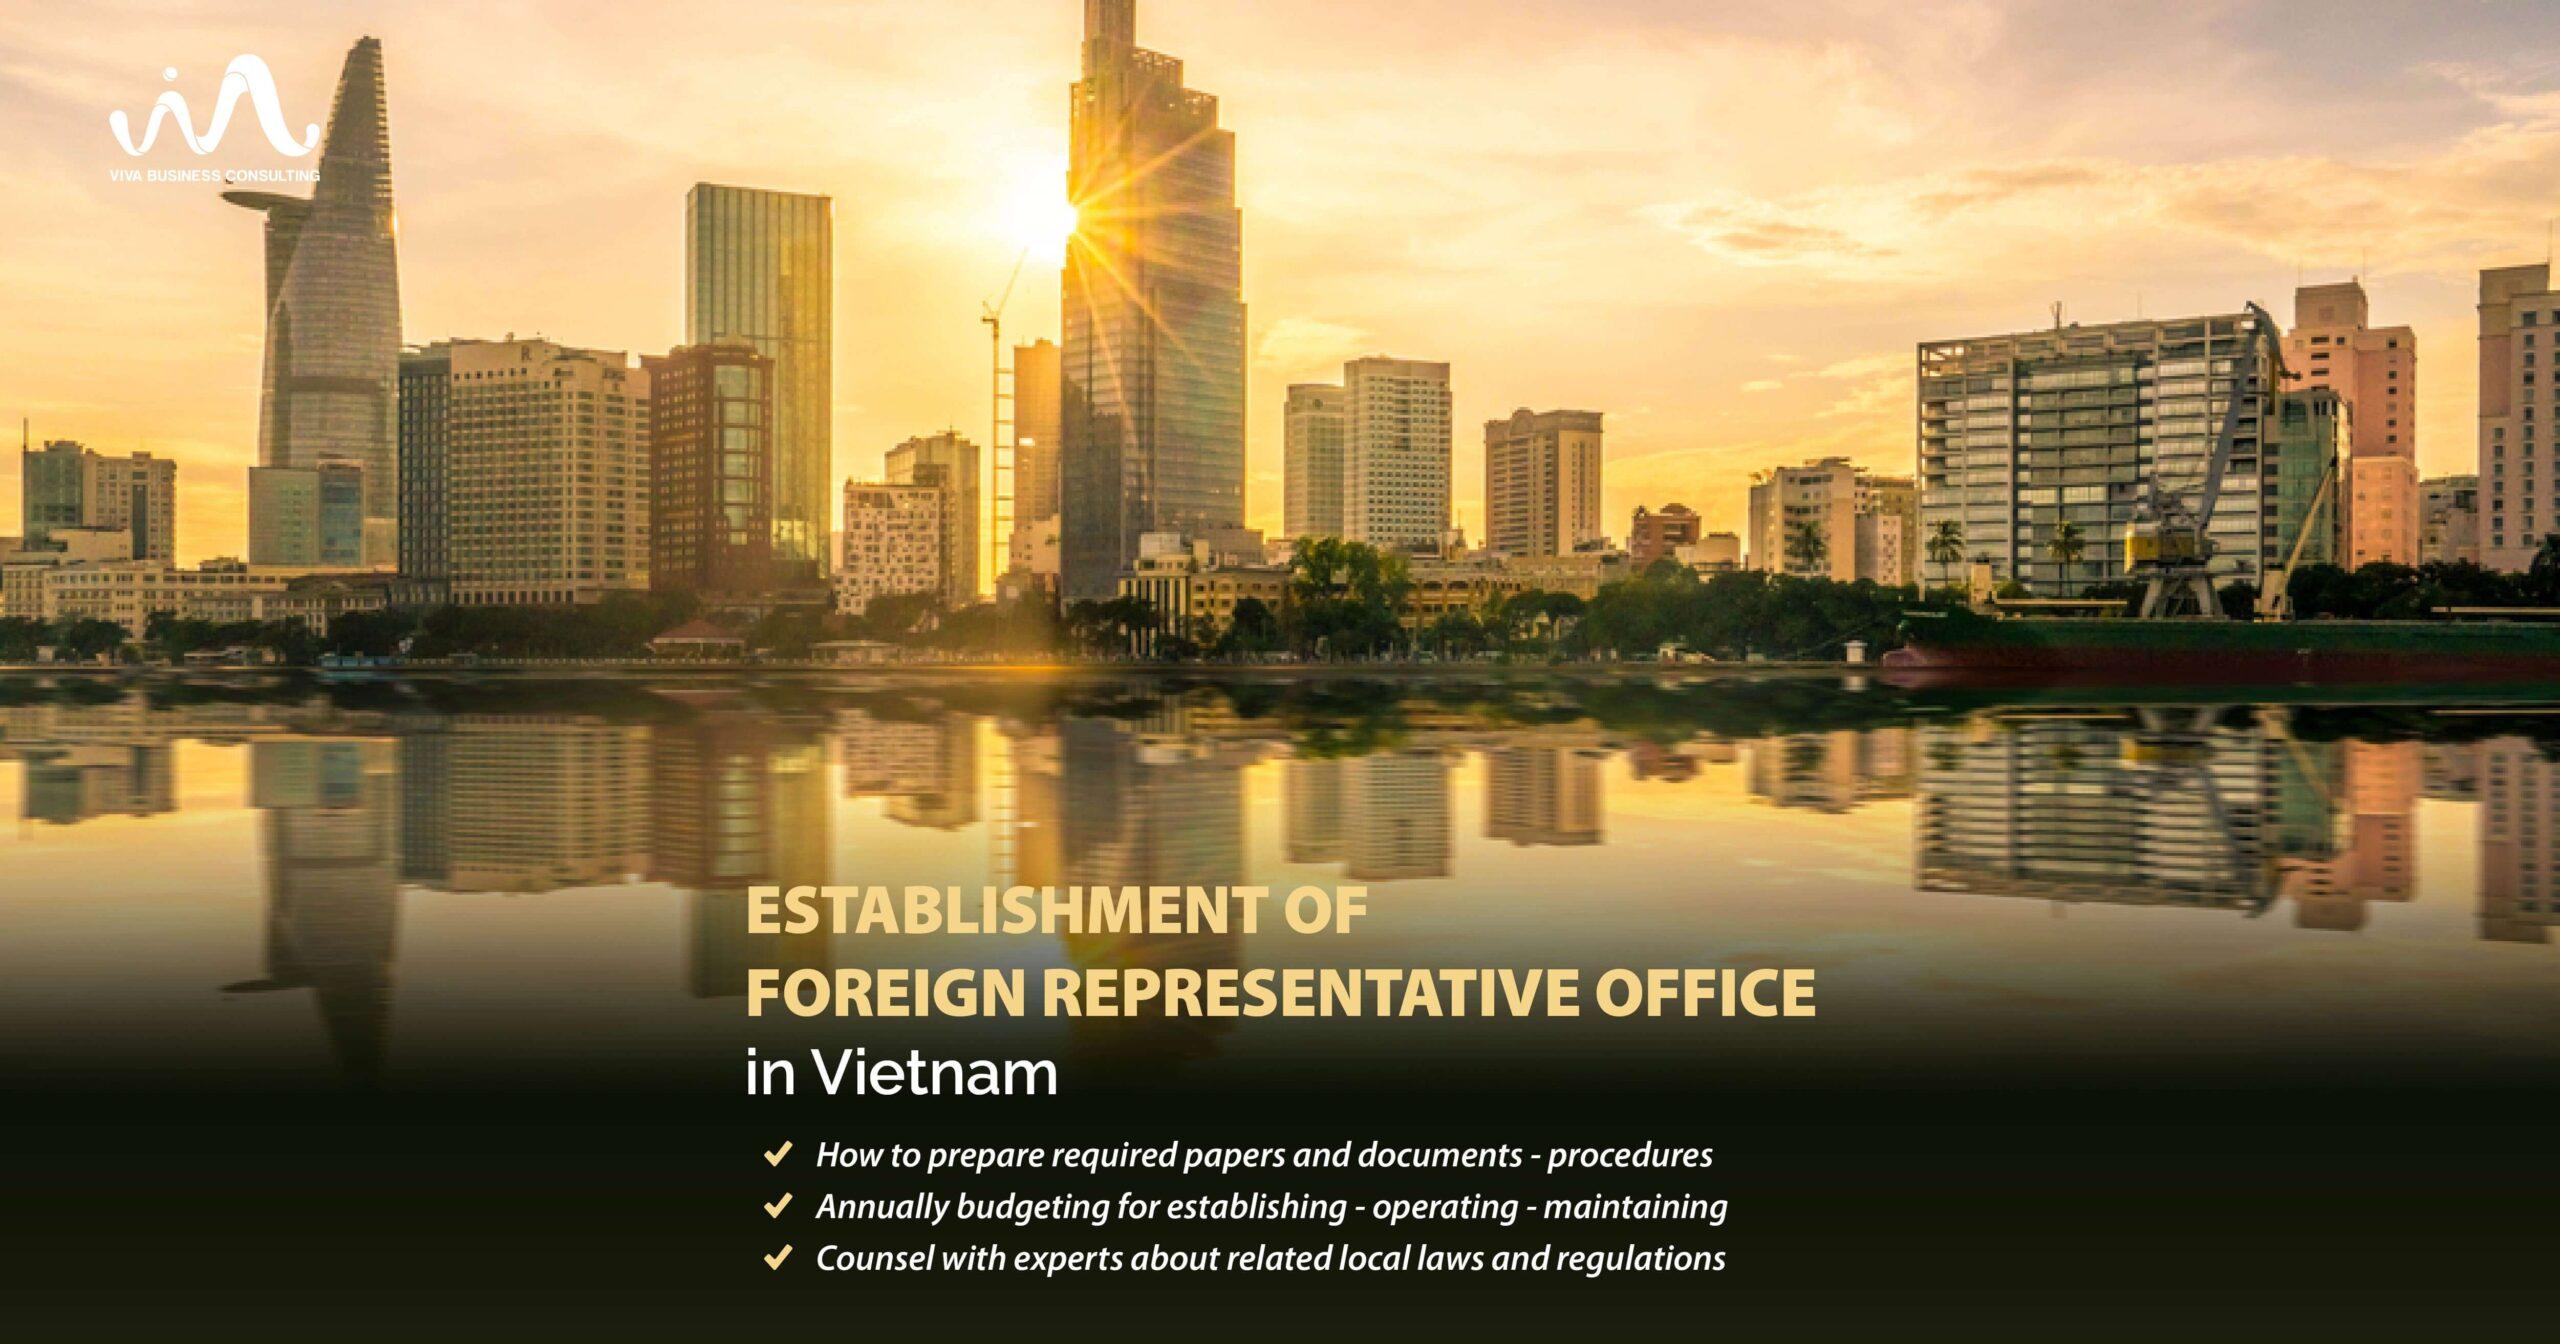 Establish foreign representative office in Vietnam